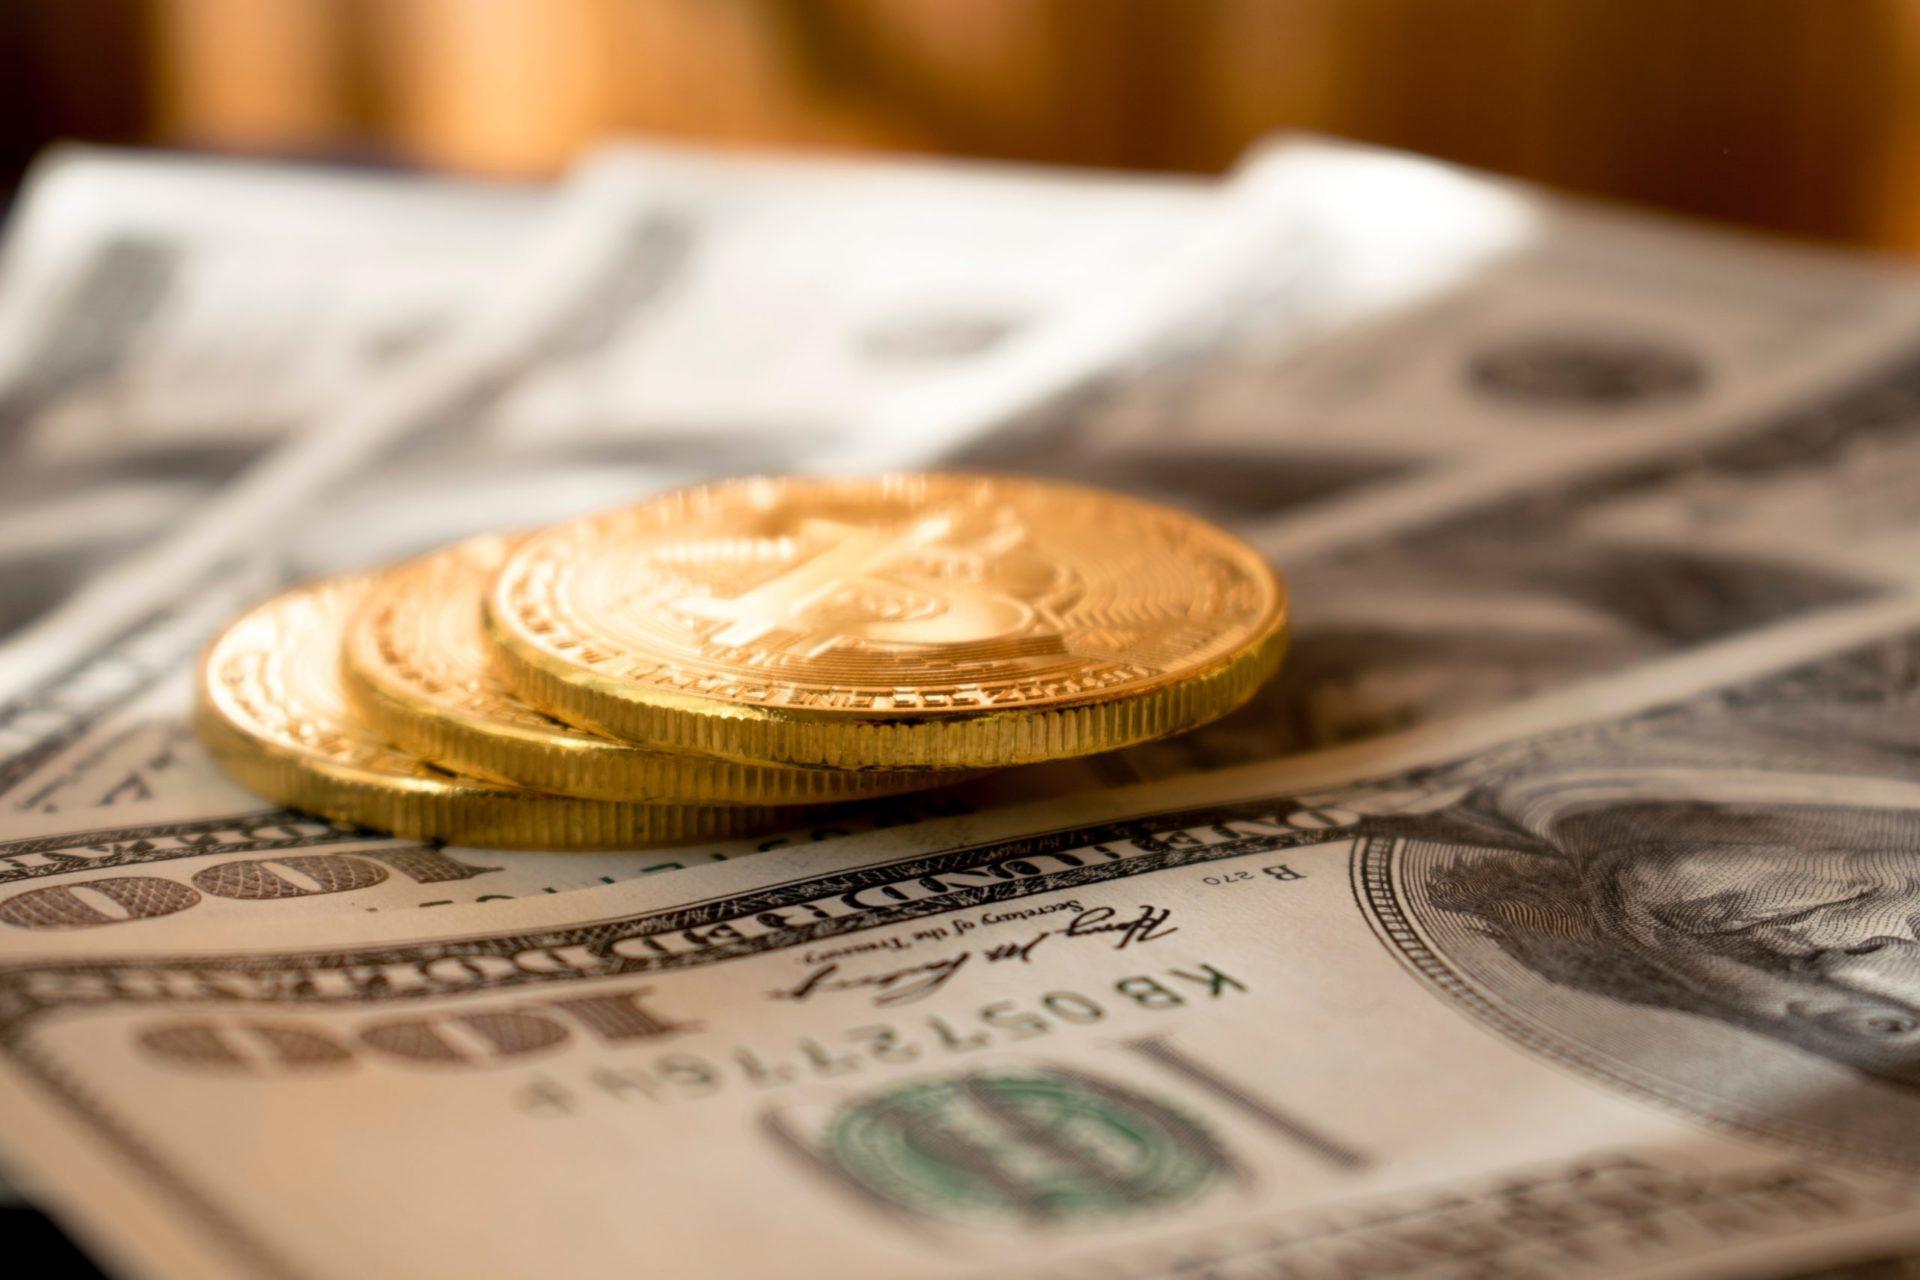 Mid-2020 Likely to Mark Start of Bitcoin's Bull Run Past $20,000 15